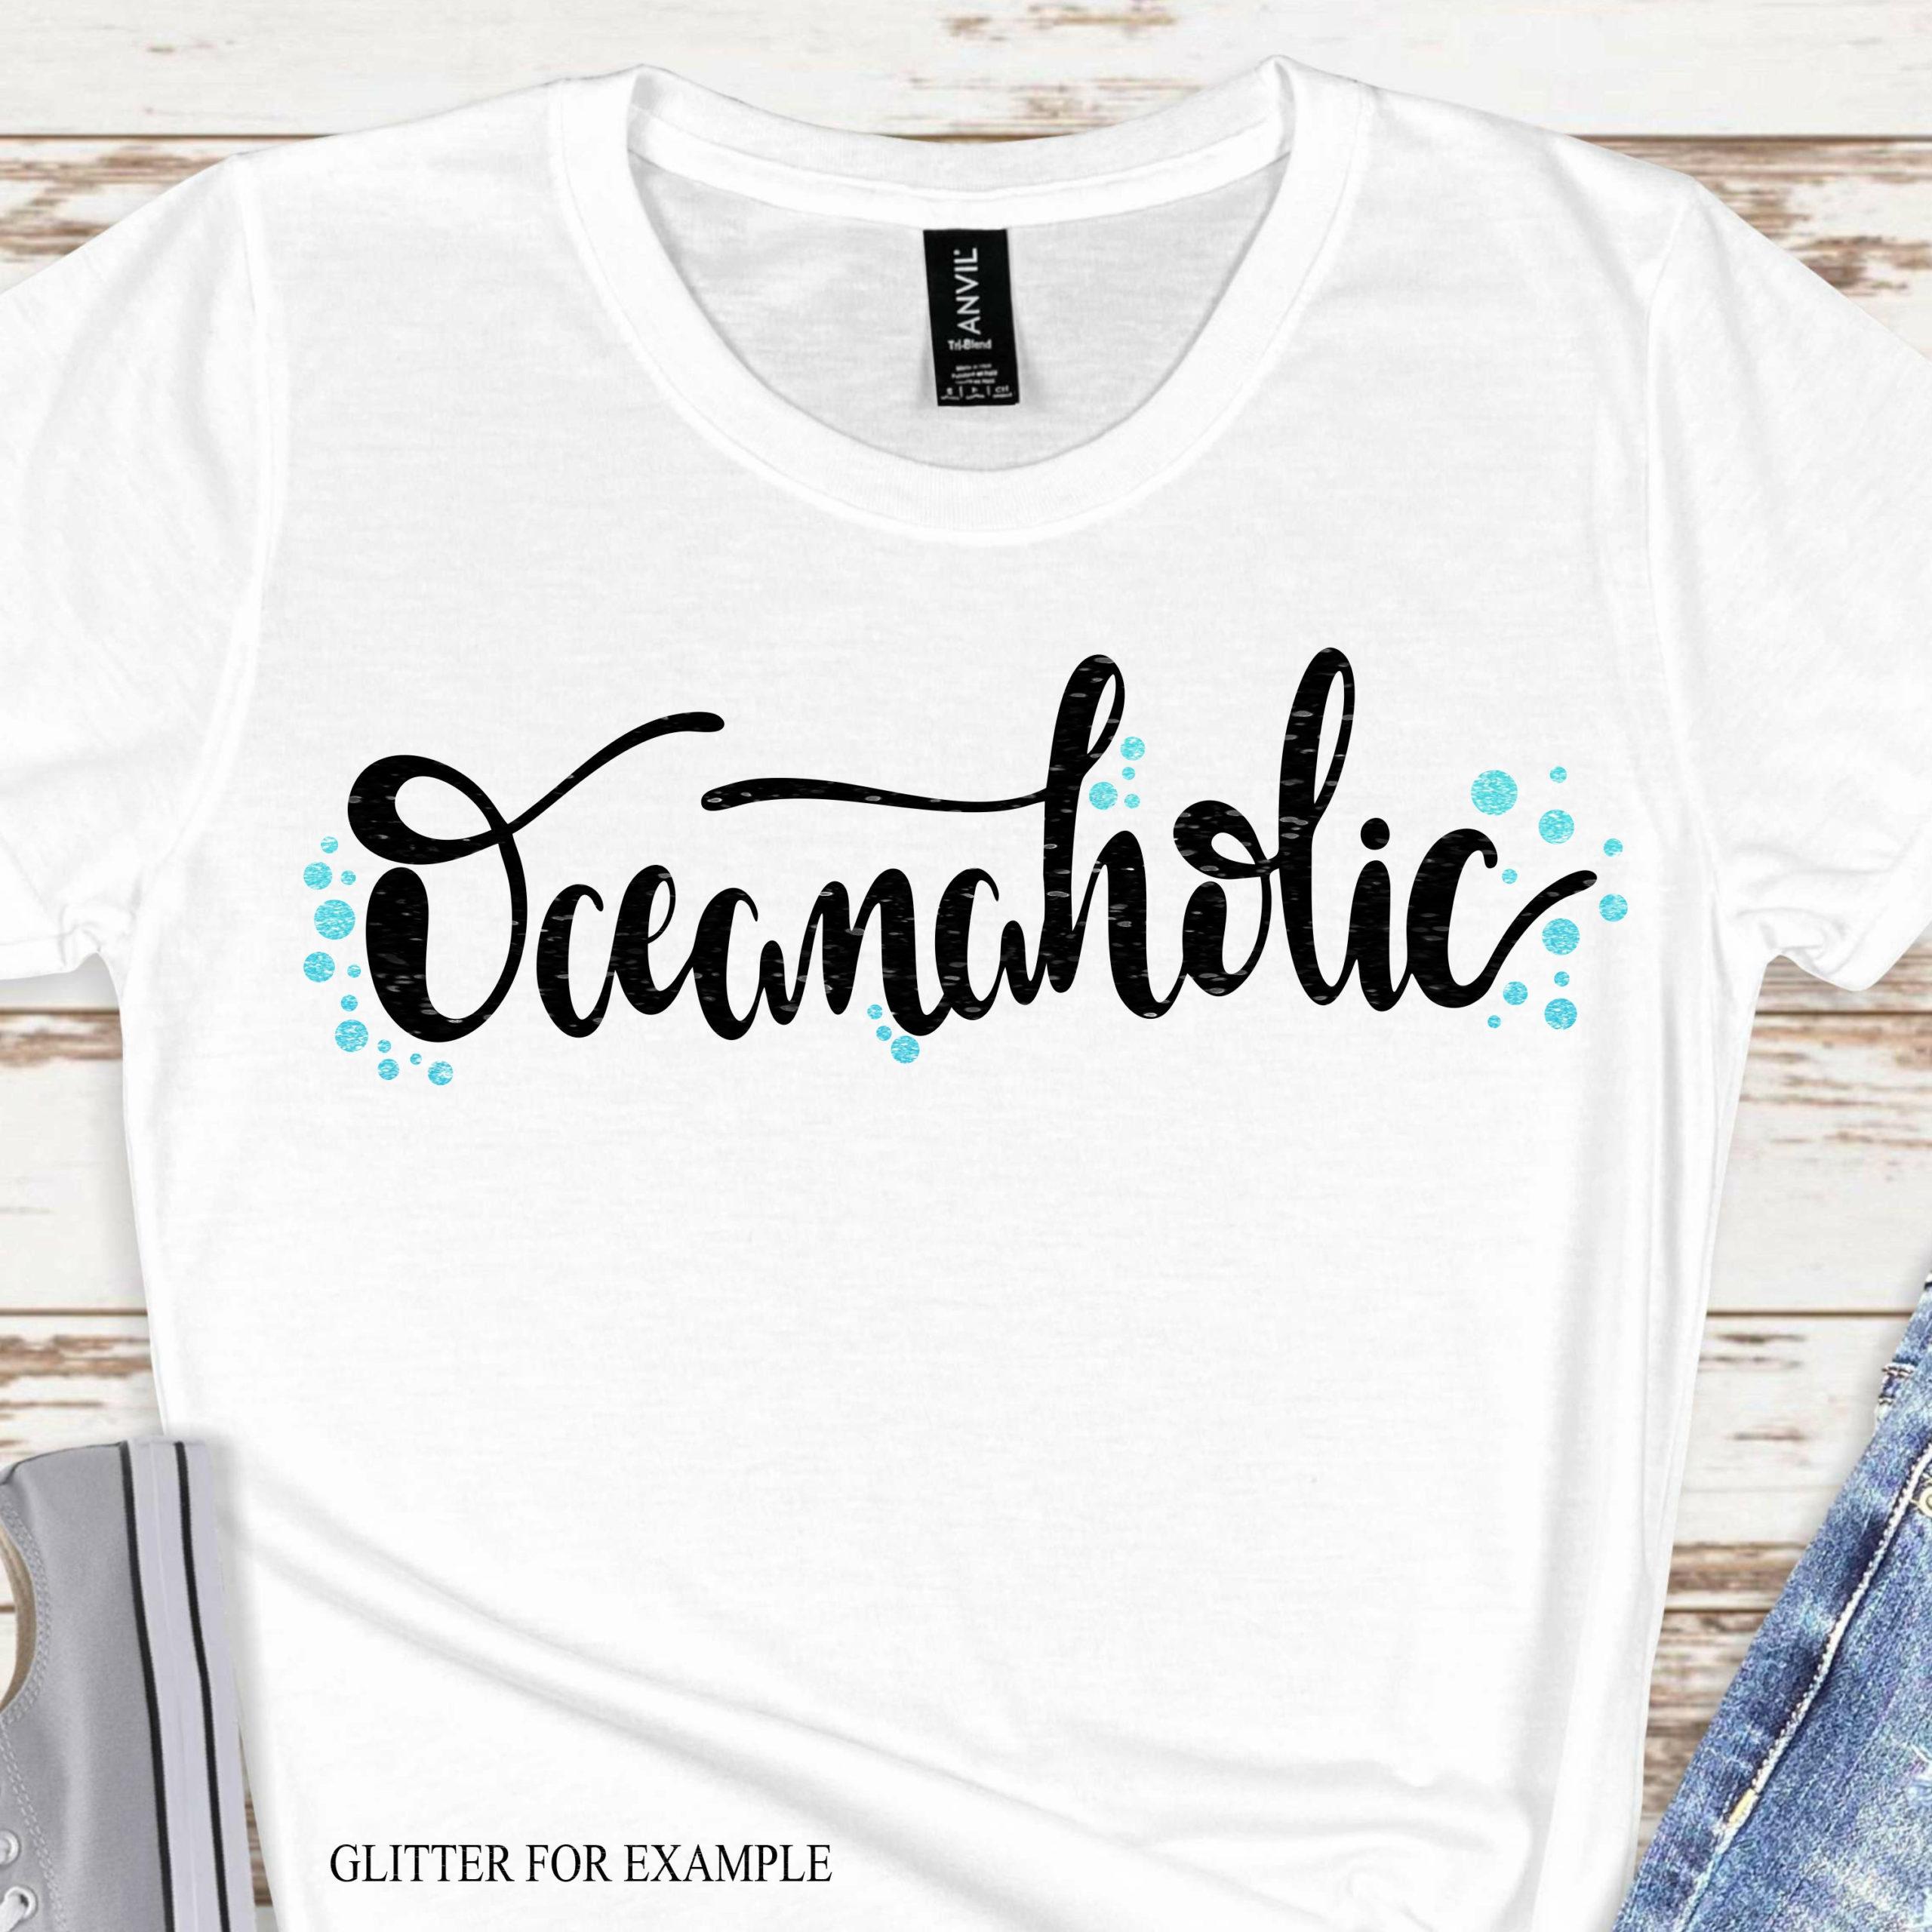 Oceanaholic-svgbeach-svg-summer-mermaid-svg-summer-svg-summertime-svgbeach-life-svg-beachy-svg-for-cricut-retro-beach-svg-5ef78c96